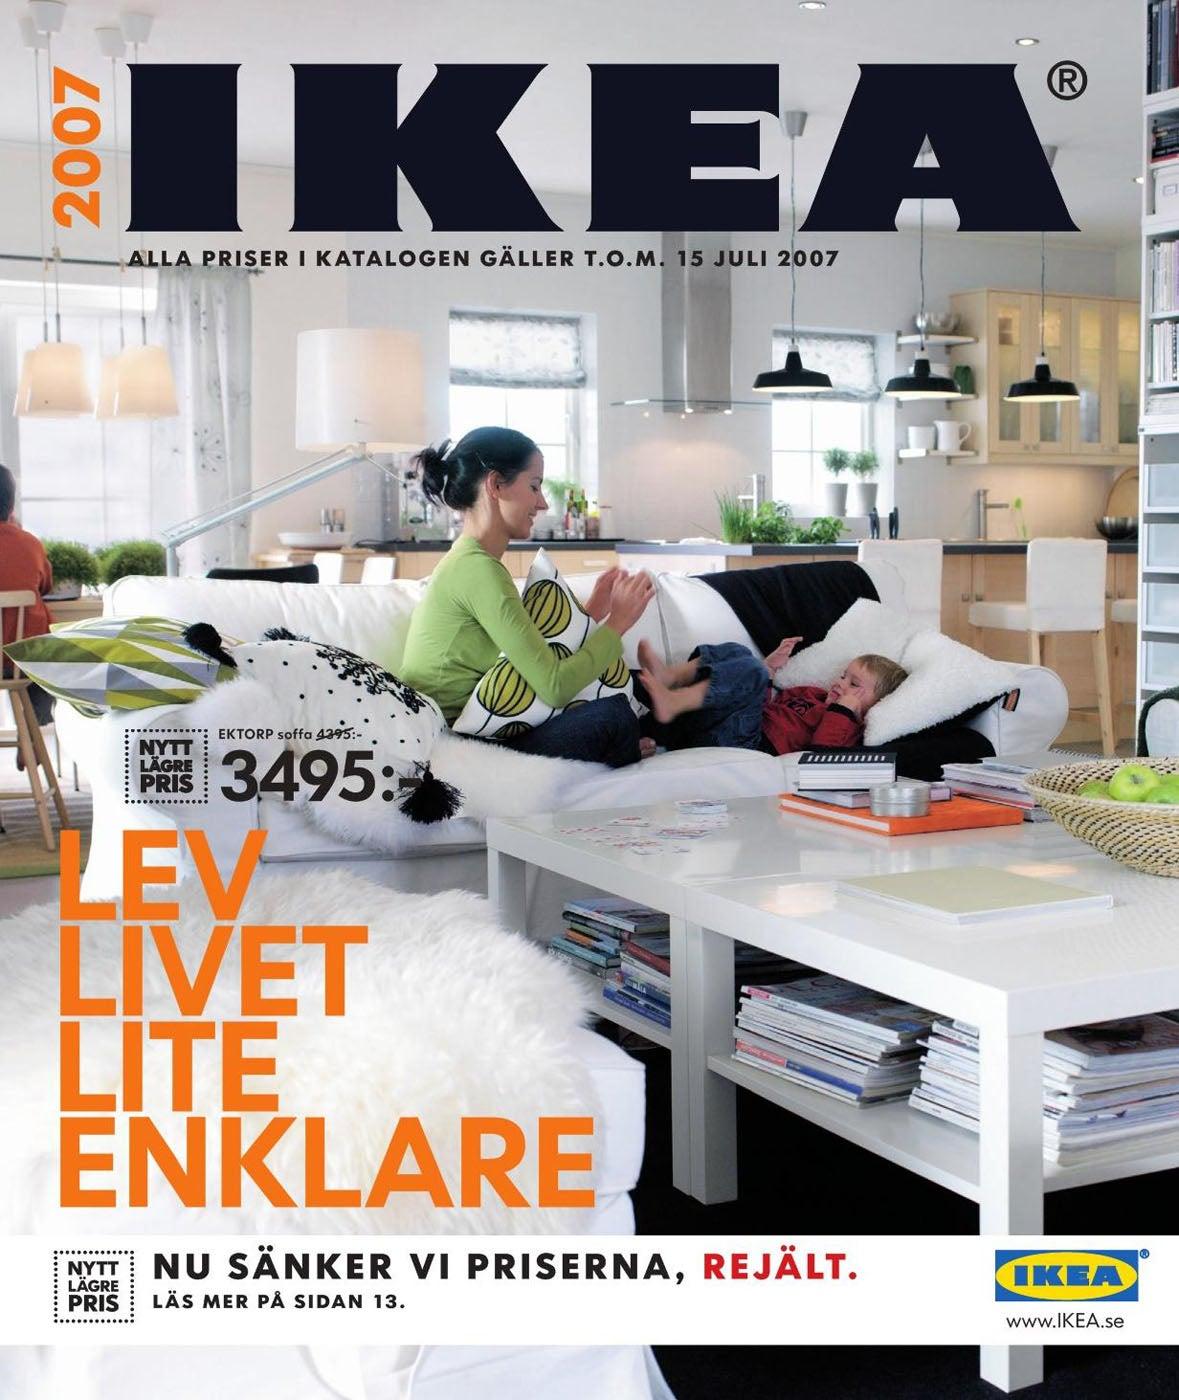 Every ikea catalogue cover since 1951 gizmodo australia - Catalogo ikea 2007 ...